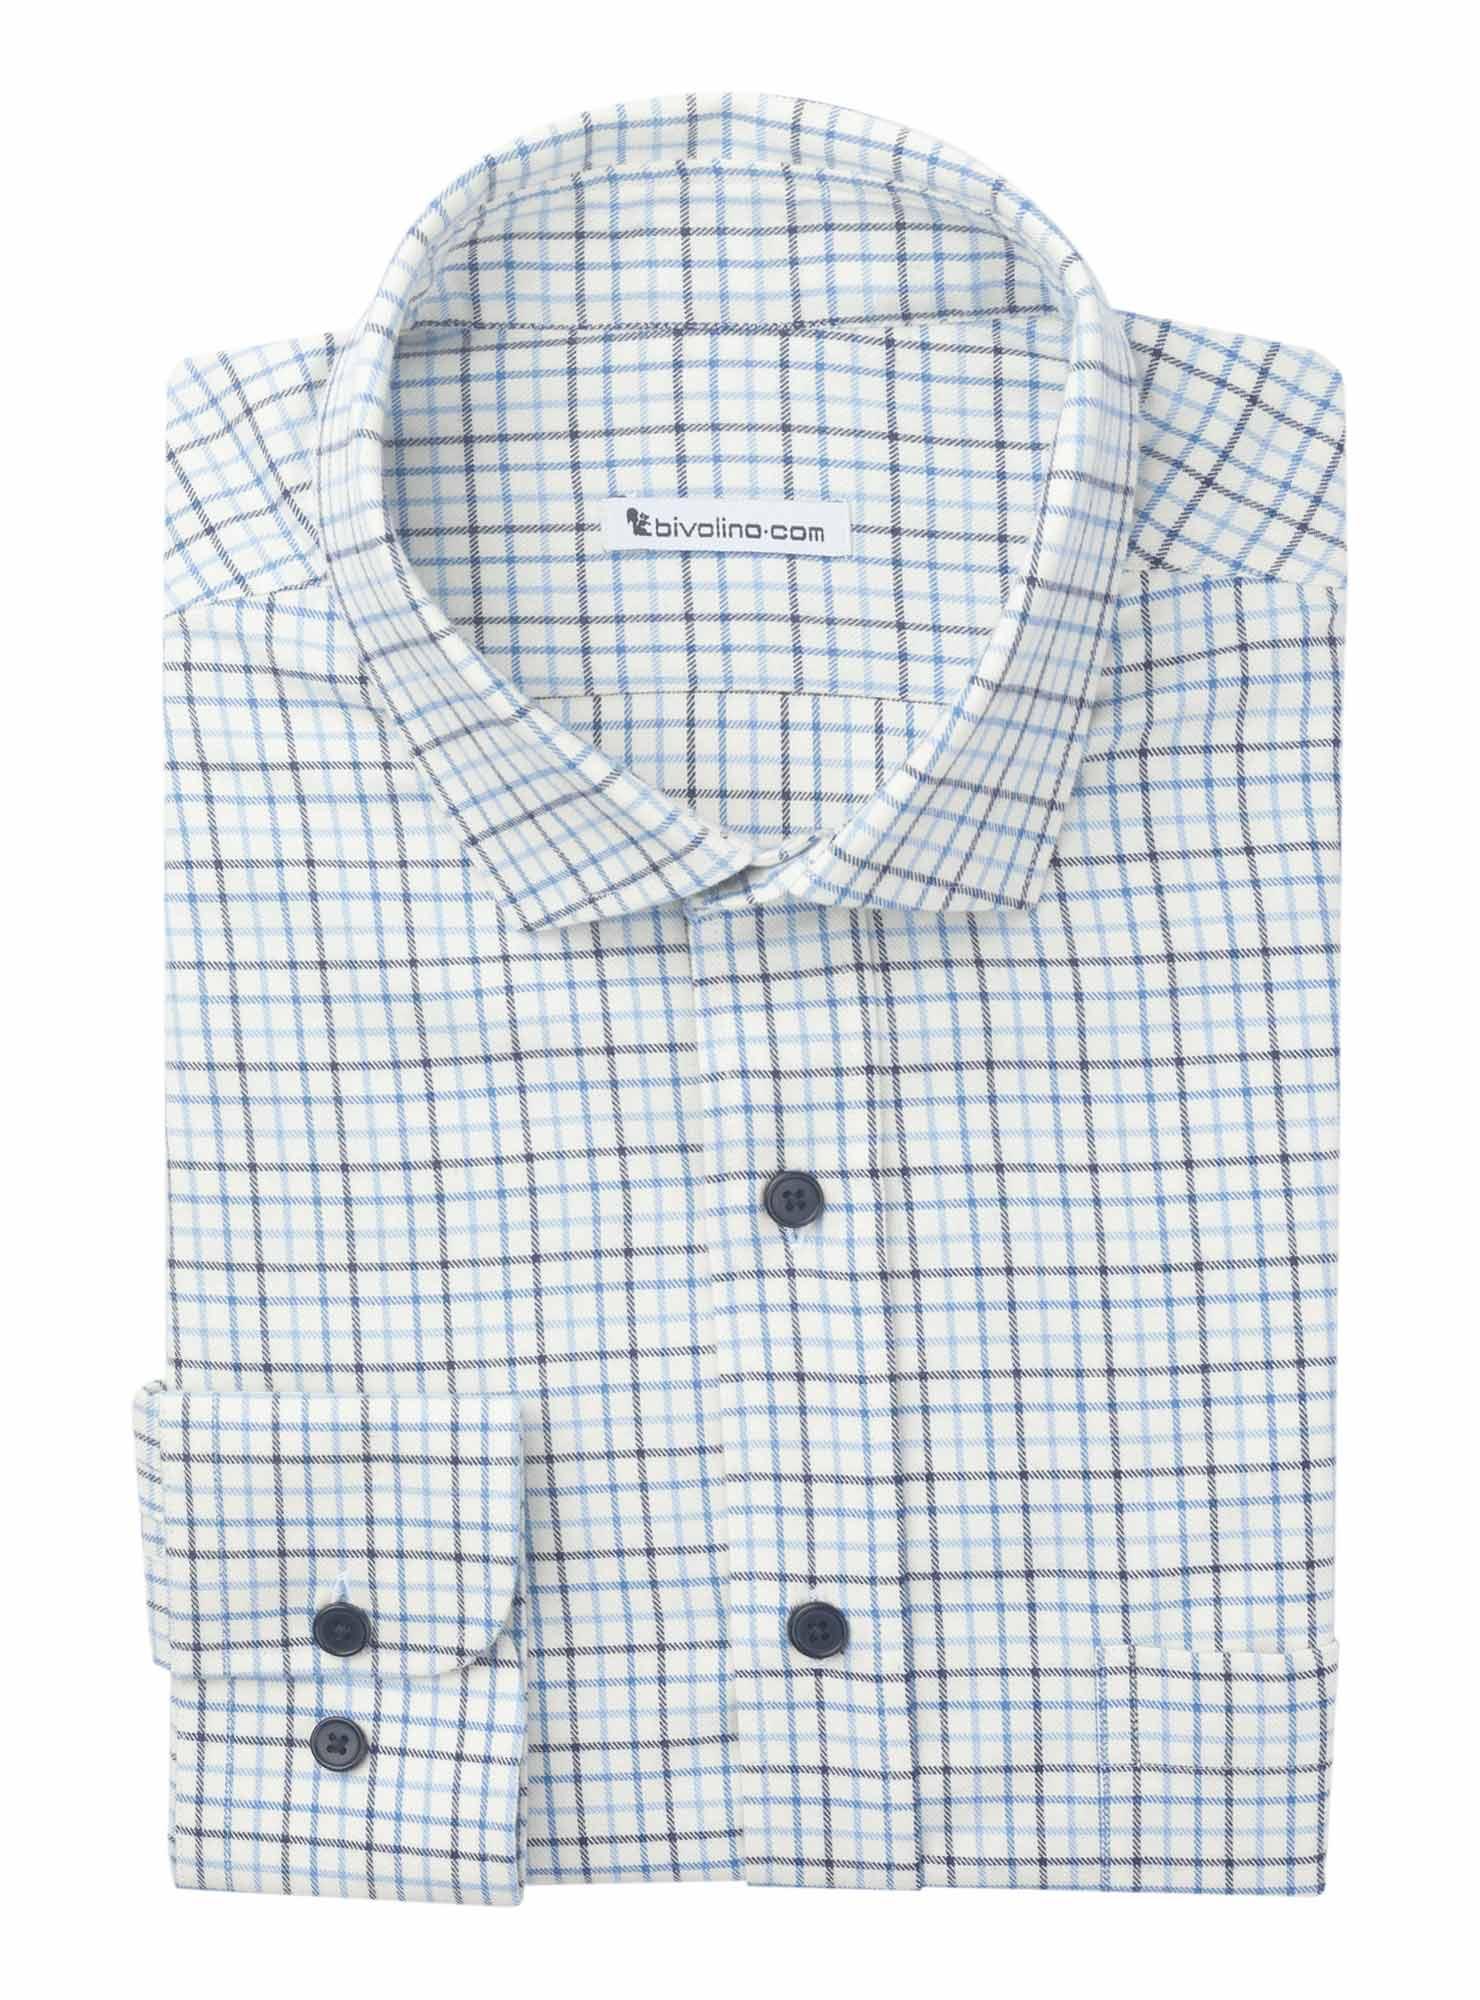 LECCE - Cuadros de franela tartán viyella camisa de hombre - PARA 9 - TARTAN TATTERSALL